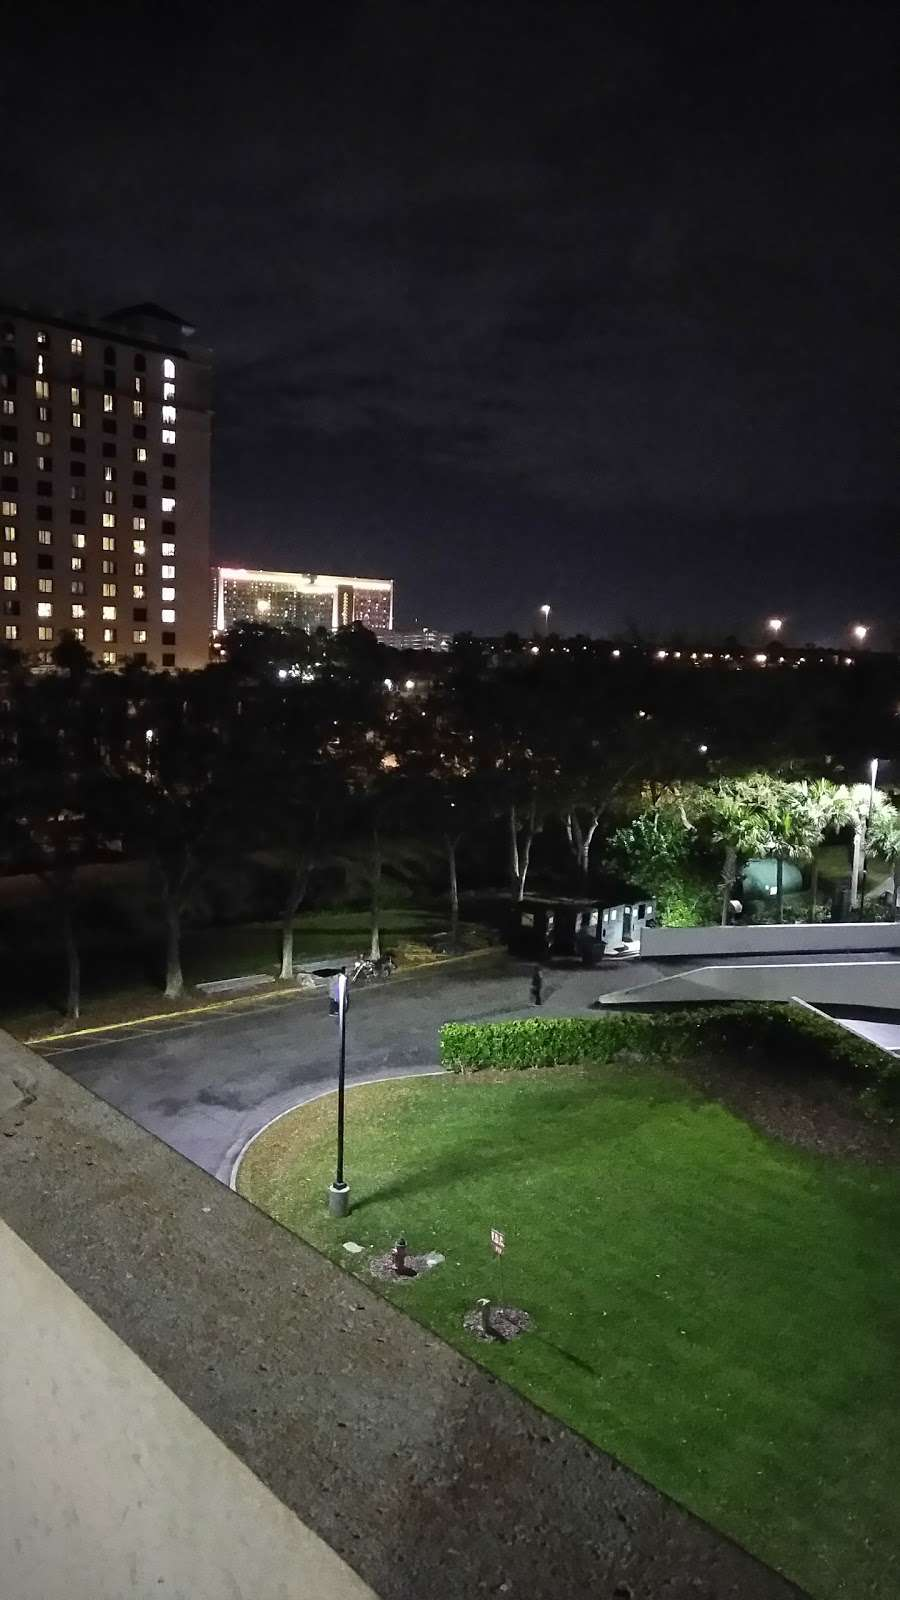 Wyndham Destinations - real estate agency  | Photo 7 of 8 | Address: 6277 Sea Harbor Dr, Orlando, FL 32821, USA | Phone: (407) 626-5200